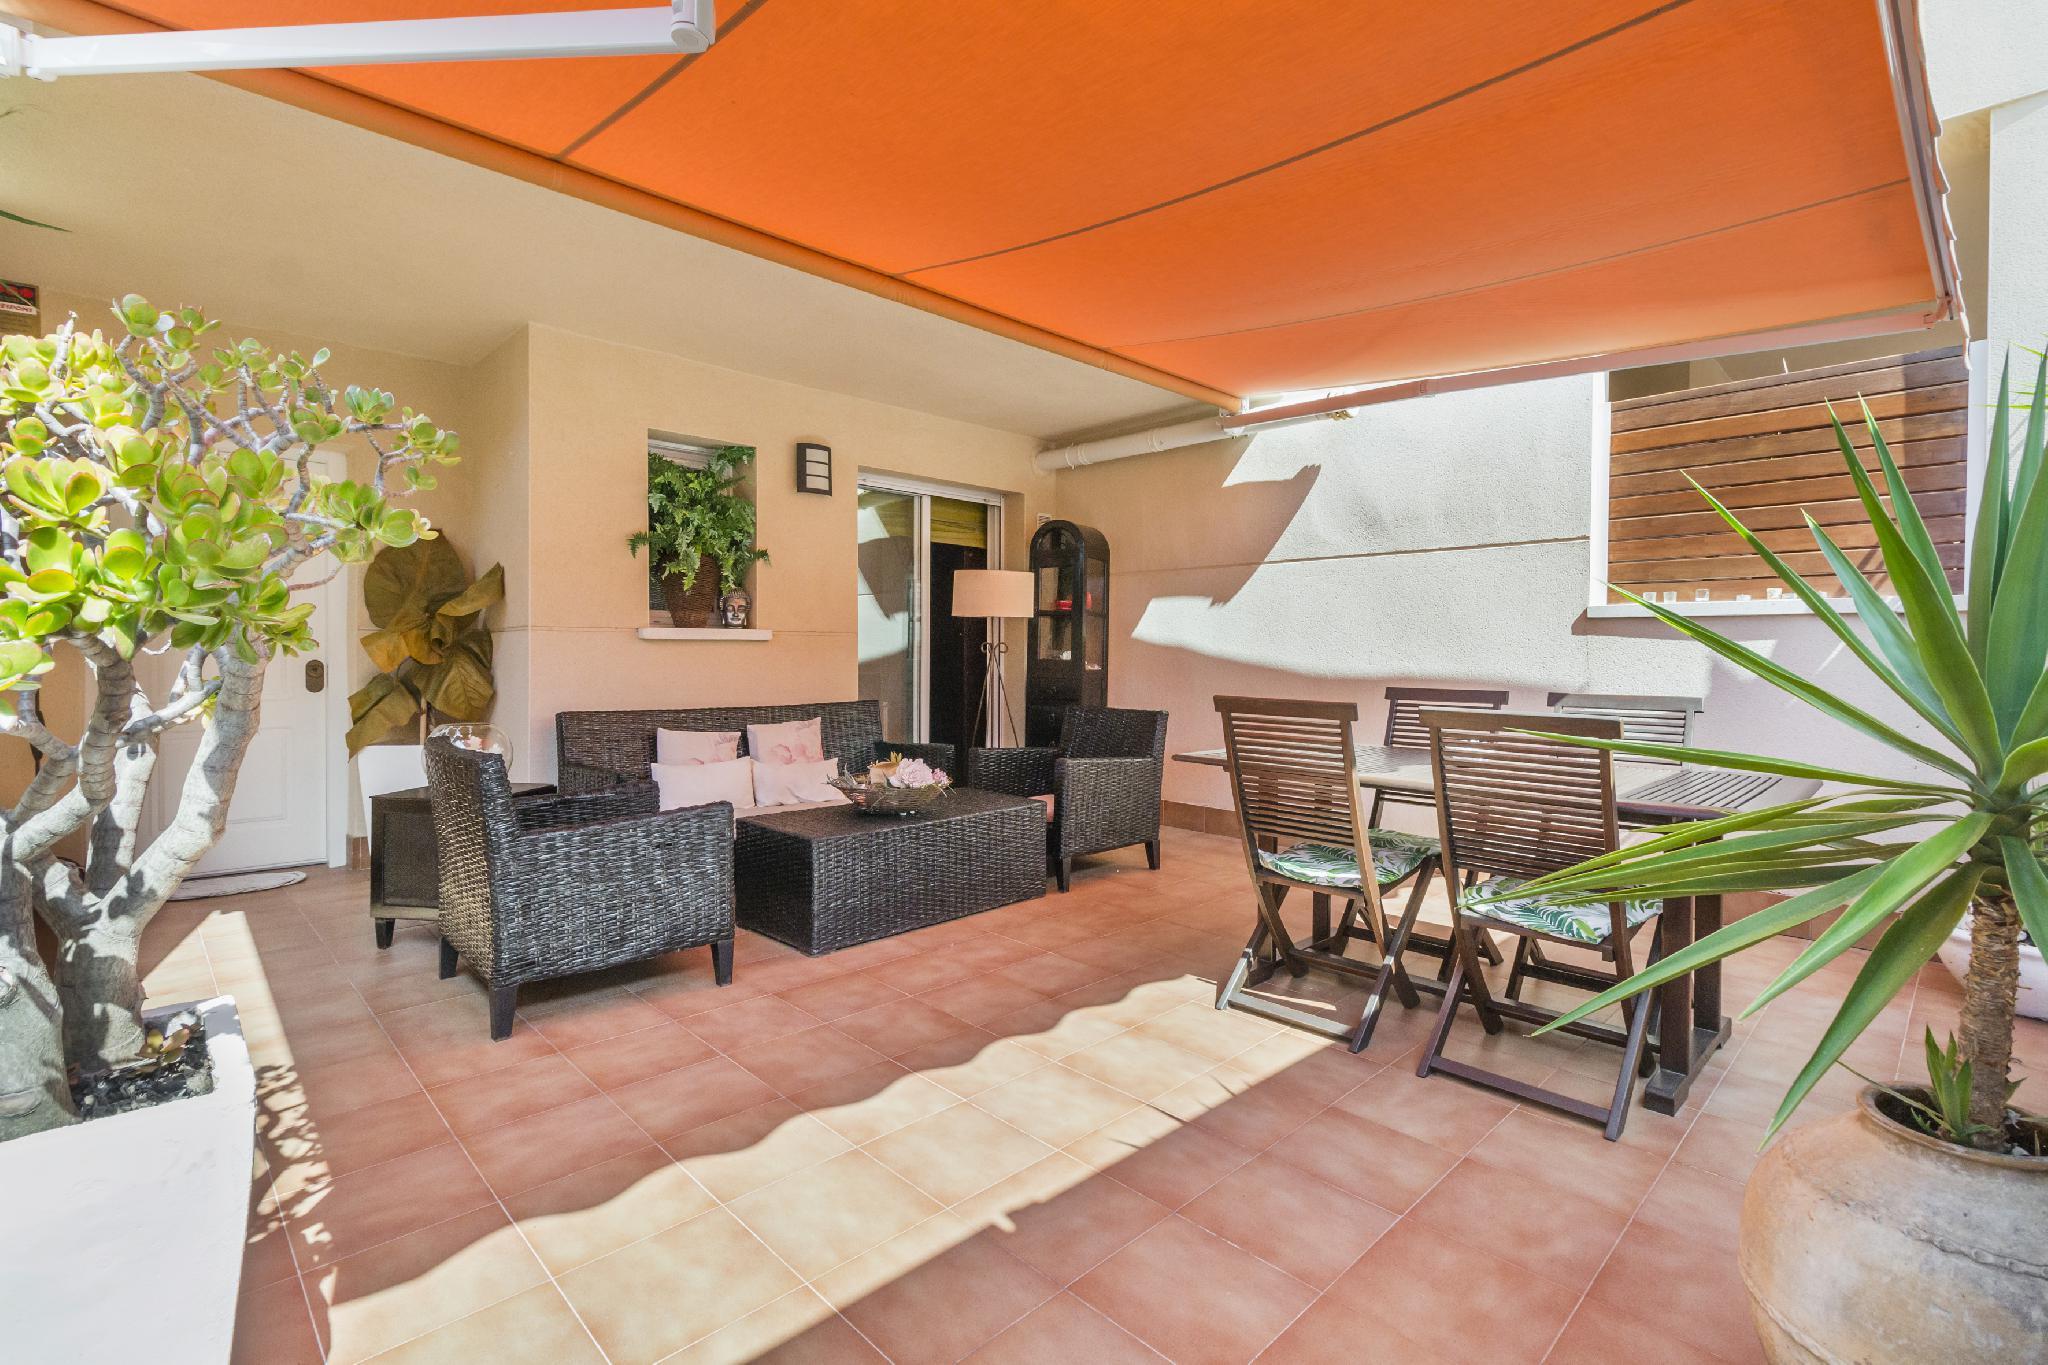 227443 - Centro, Residencial Els Pins